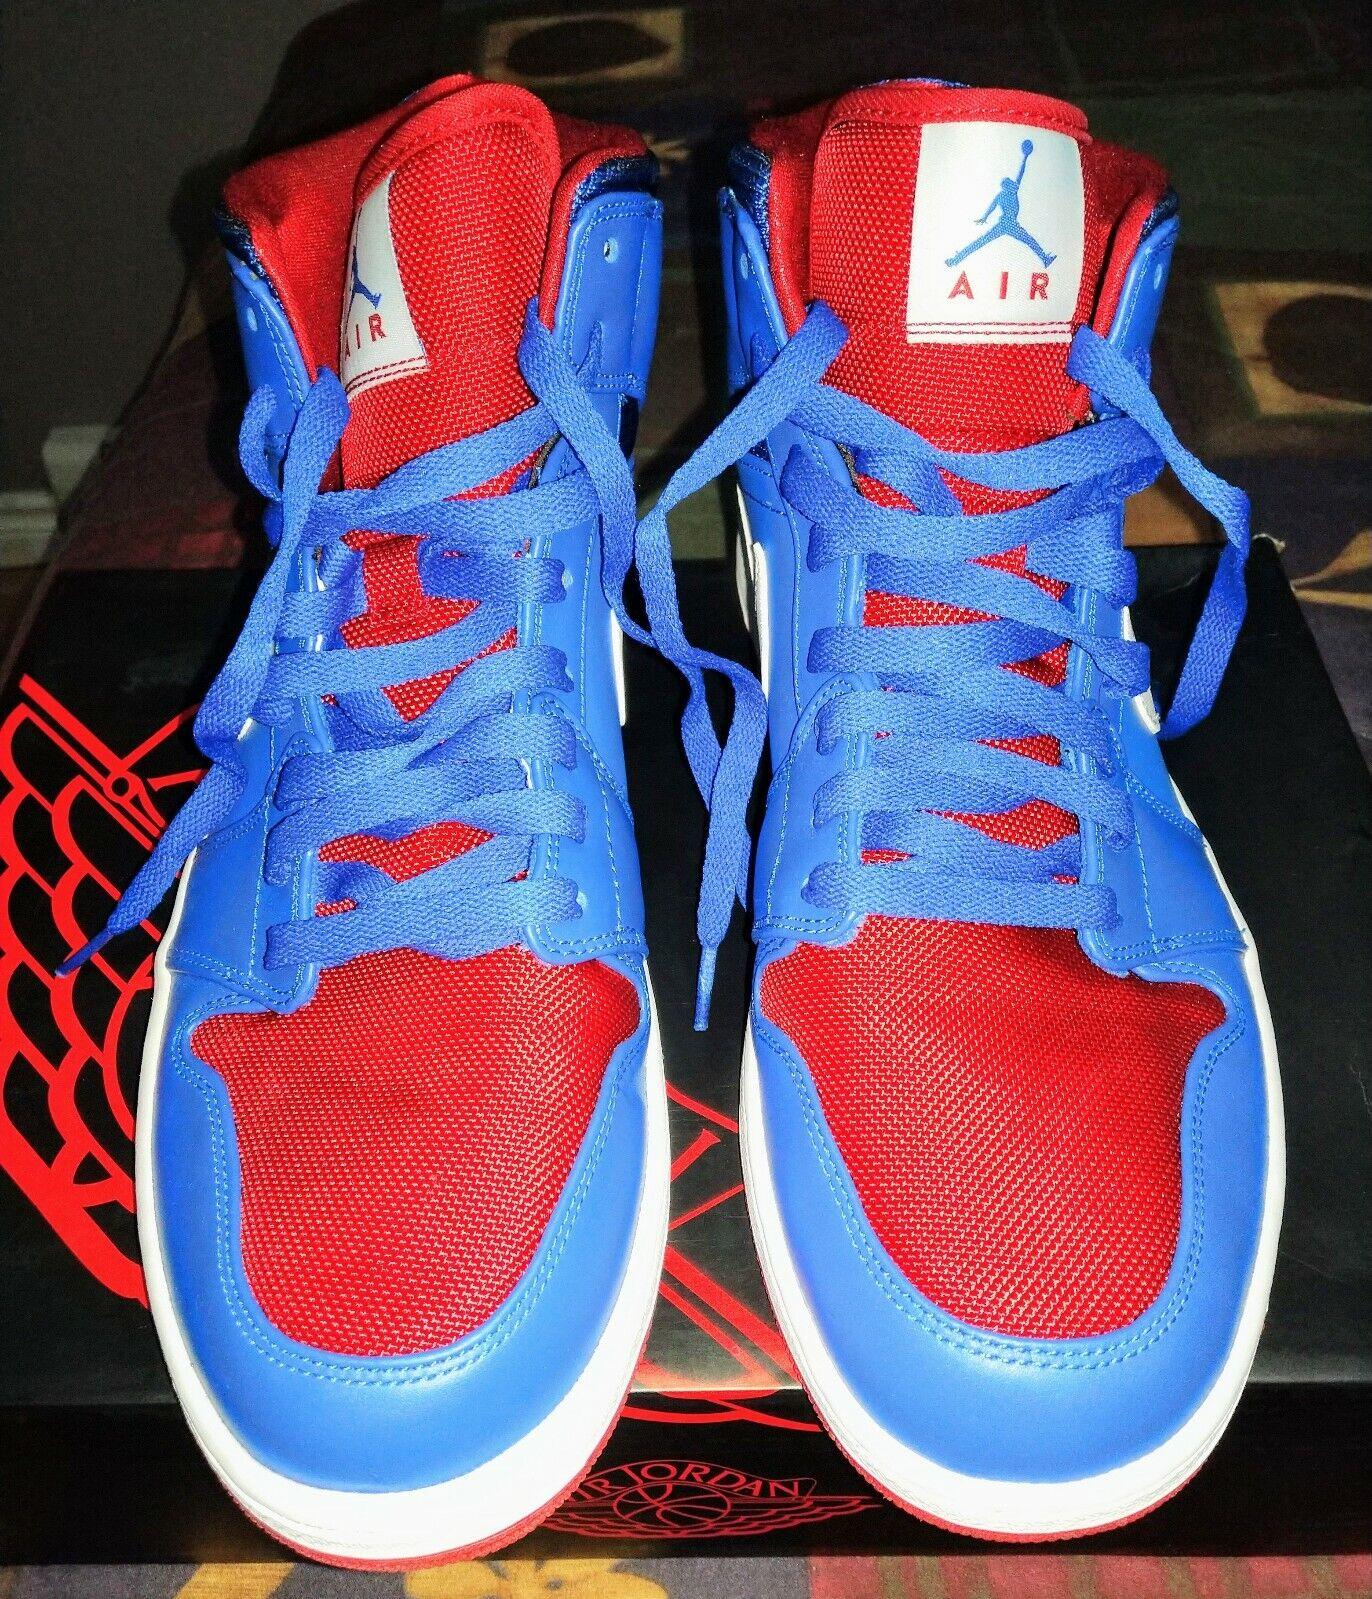 Nike Air Jordan 1 Mid Detroit Pistons Mens Größe 12 - Jordans Deadstock schuhe